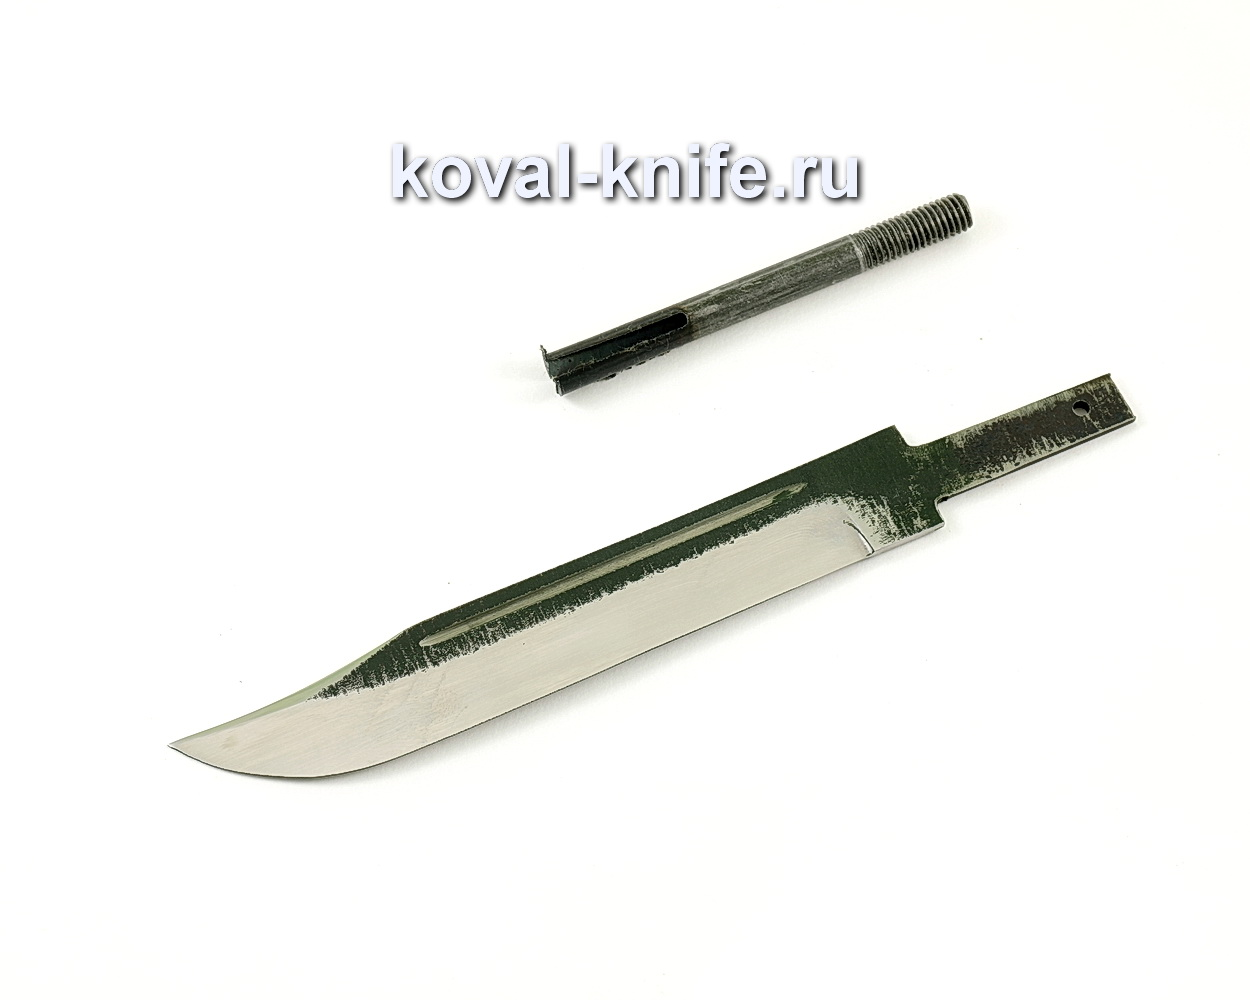 Клинок для ножа НР40 из кованой стали 110Х18 МШД Штрафбат